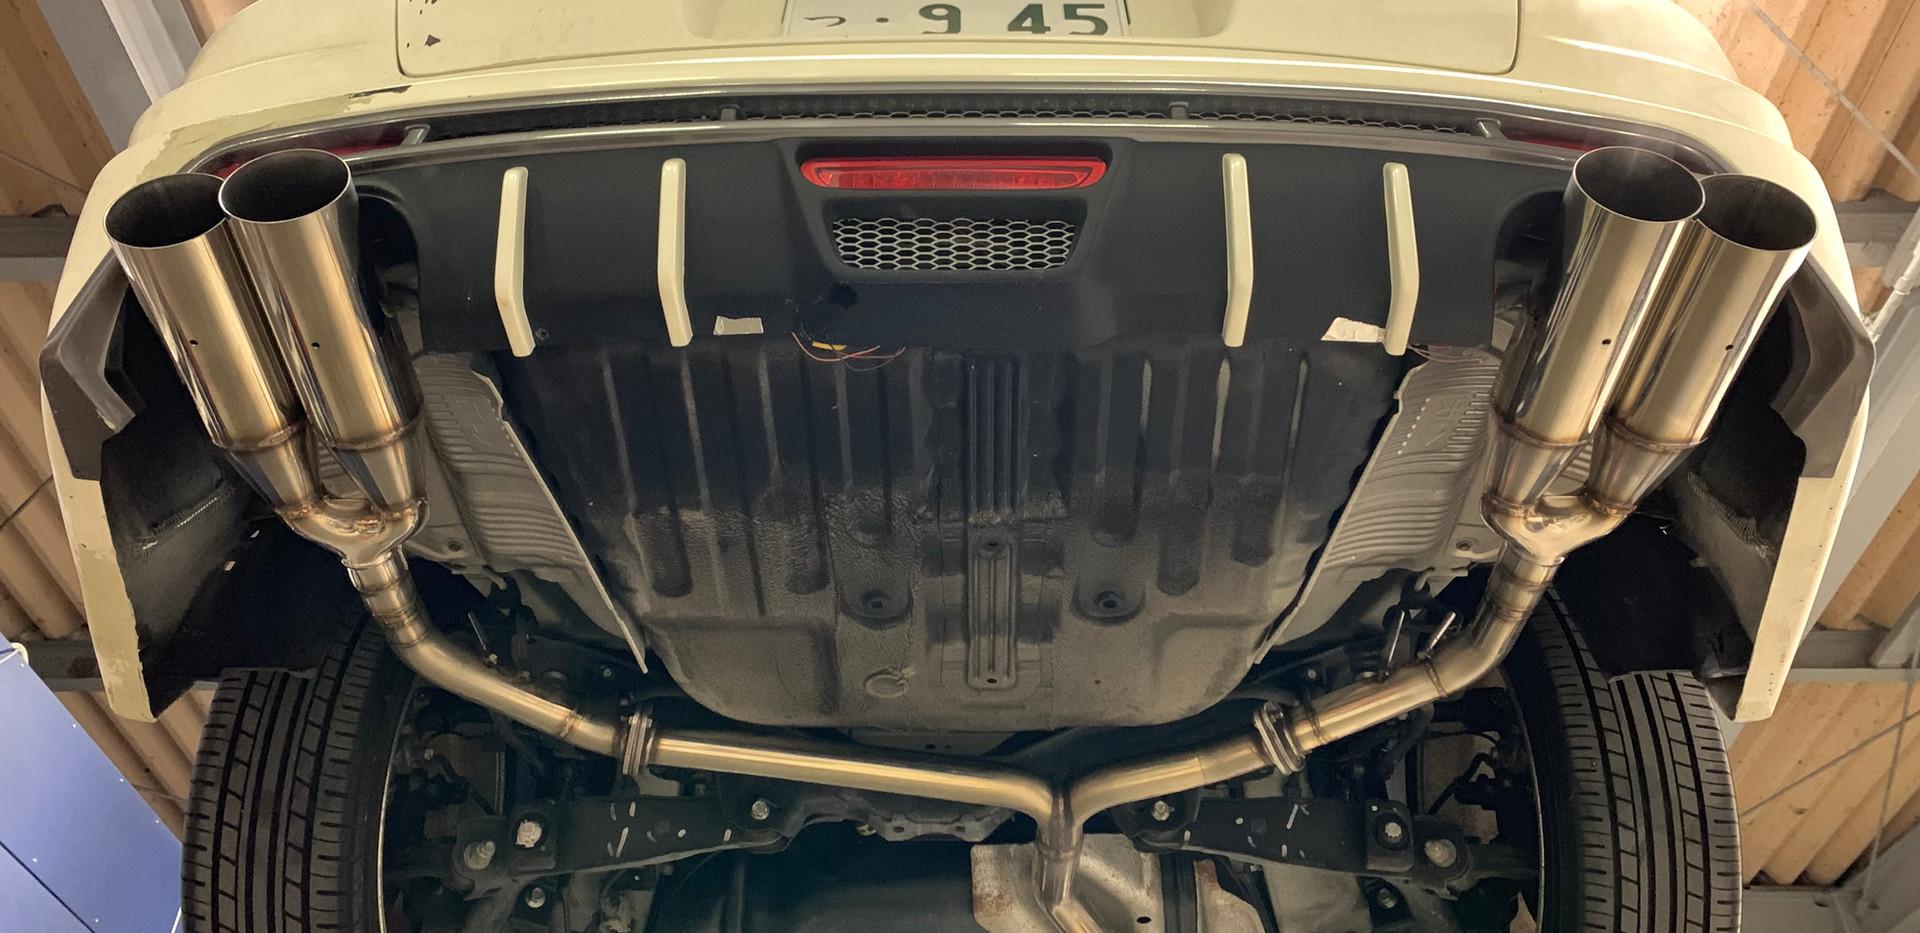 RB1オデッセイ社外品加工セミワンオフマフラーφ100デュアル左右出し+中間サイレンサ―追加